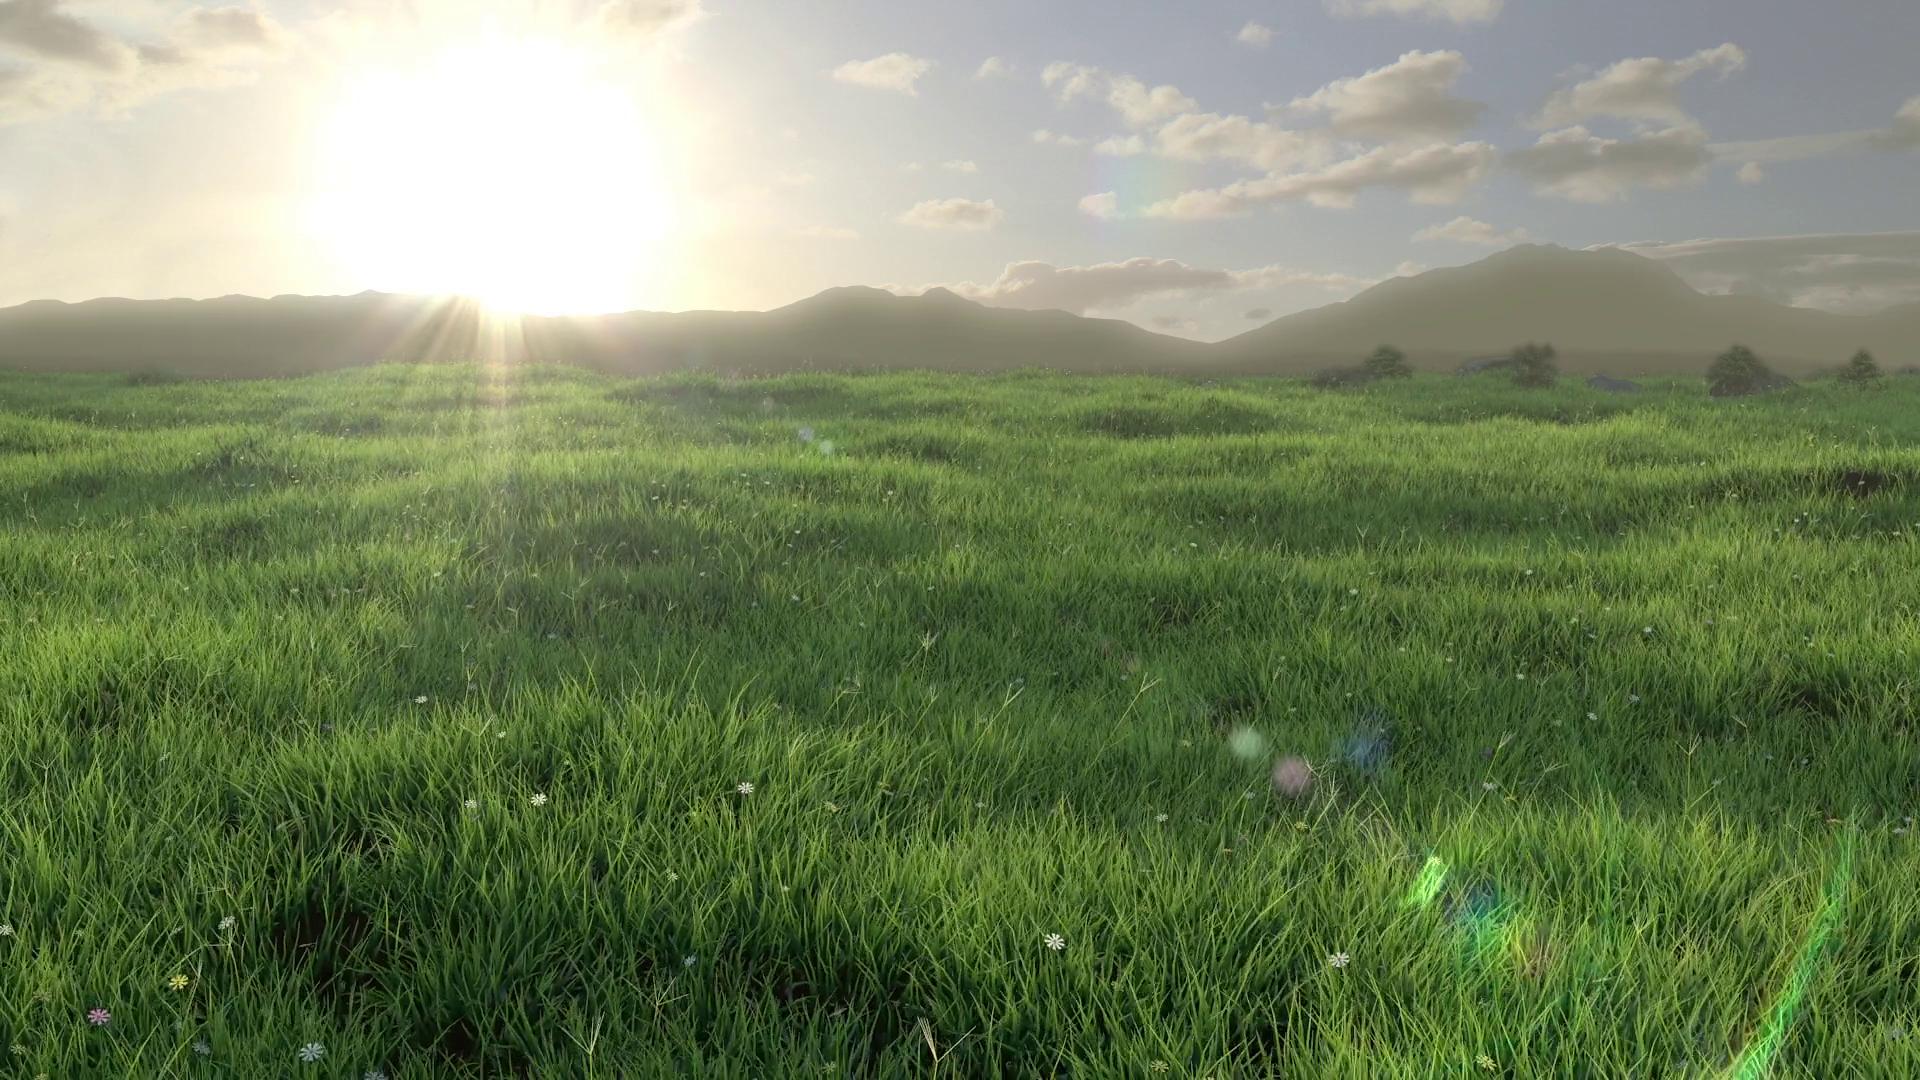 Grass Field - 3D Animation Motion Background - Videoblocks